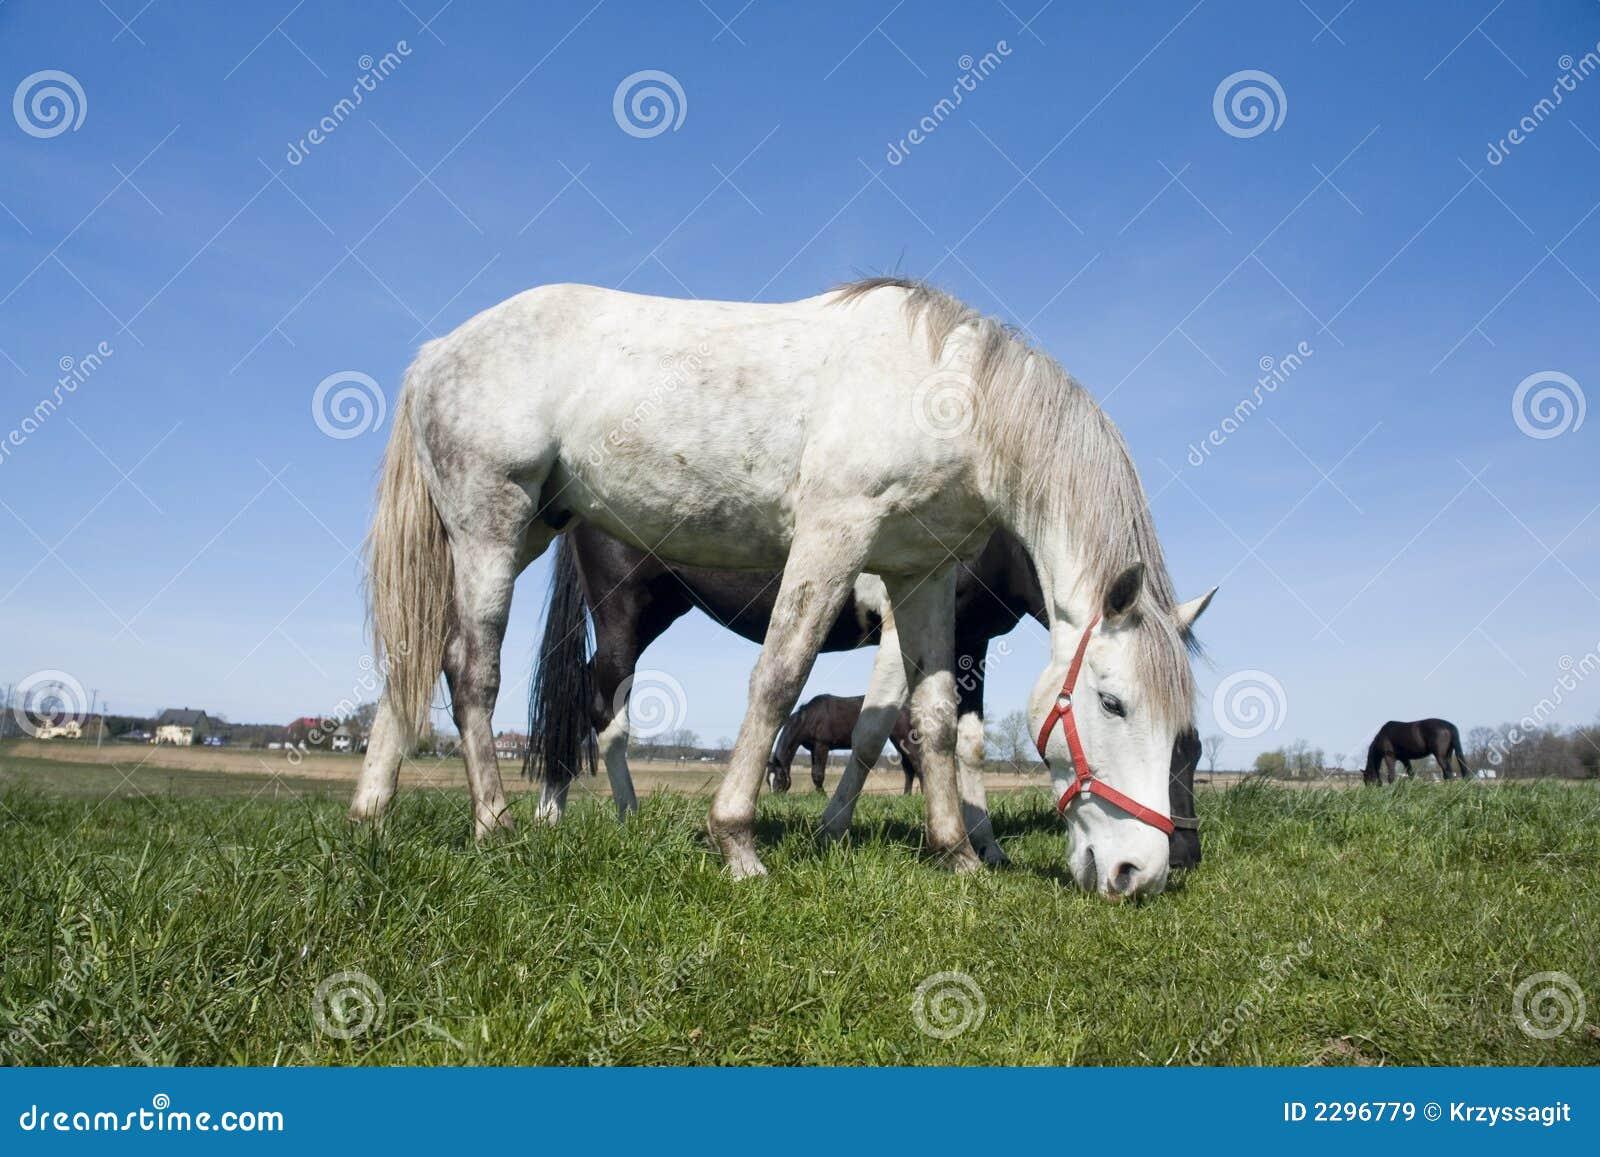 White horse eating grass - photo#16